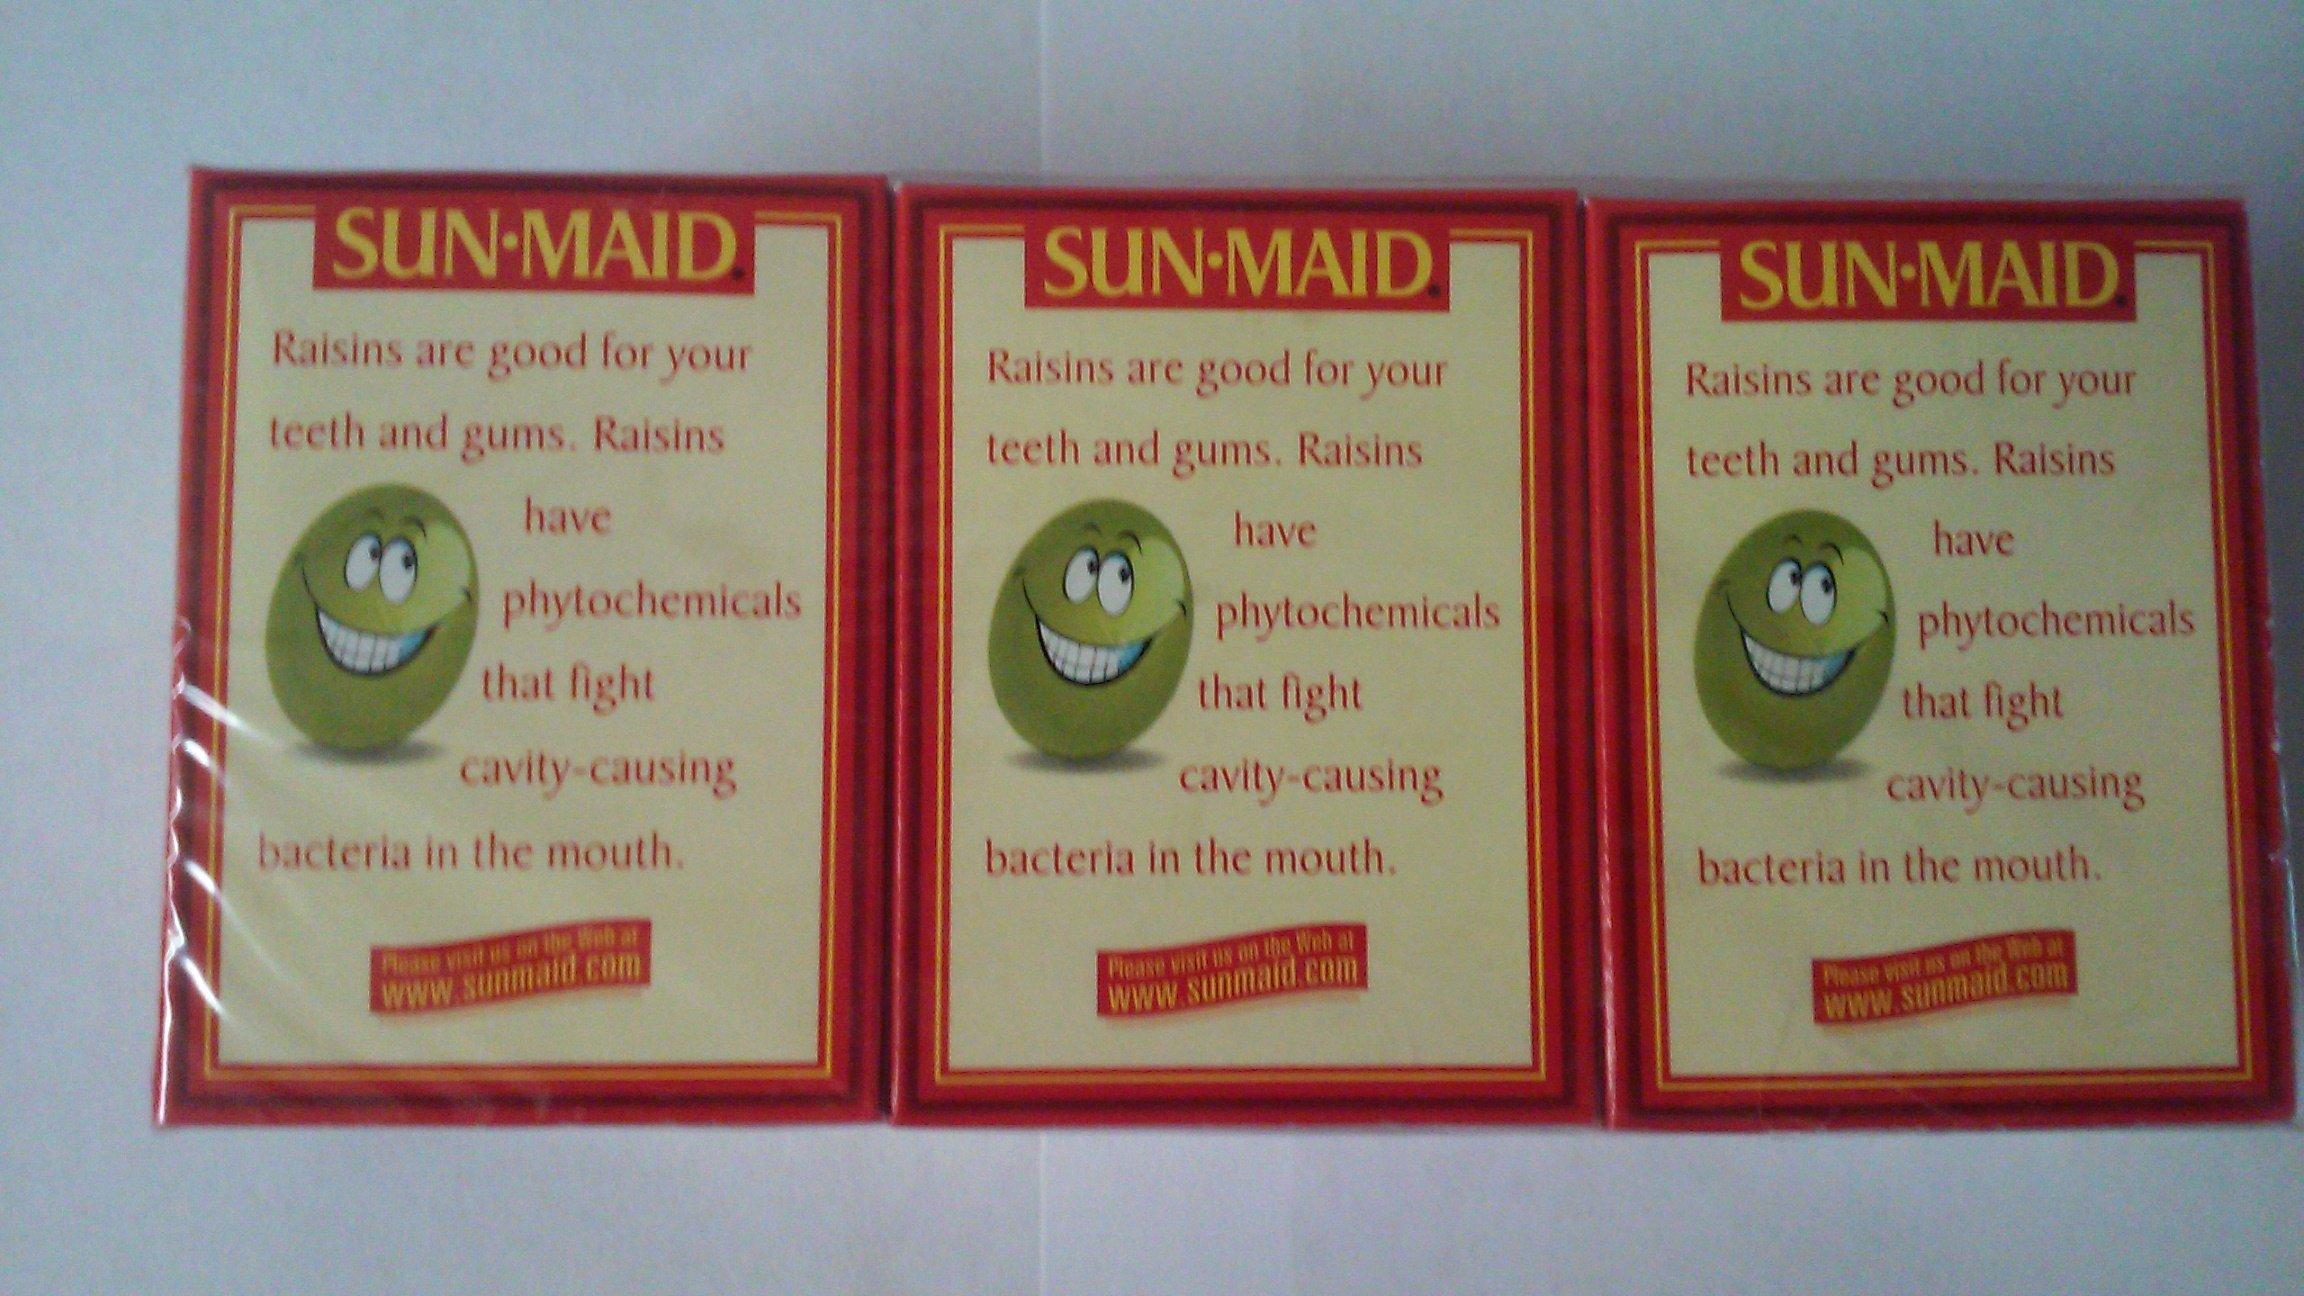 Sun-Maid Raisins 6 Packs of 1.33 Ounce (Pack of 3)